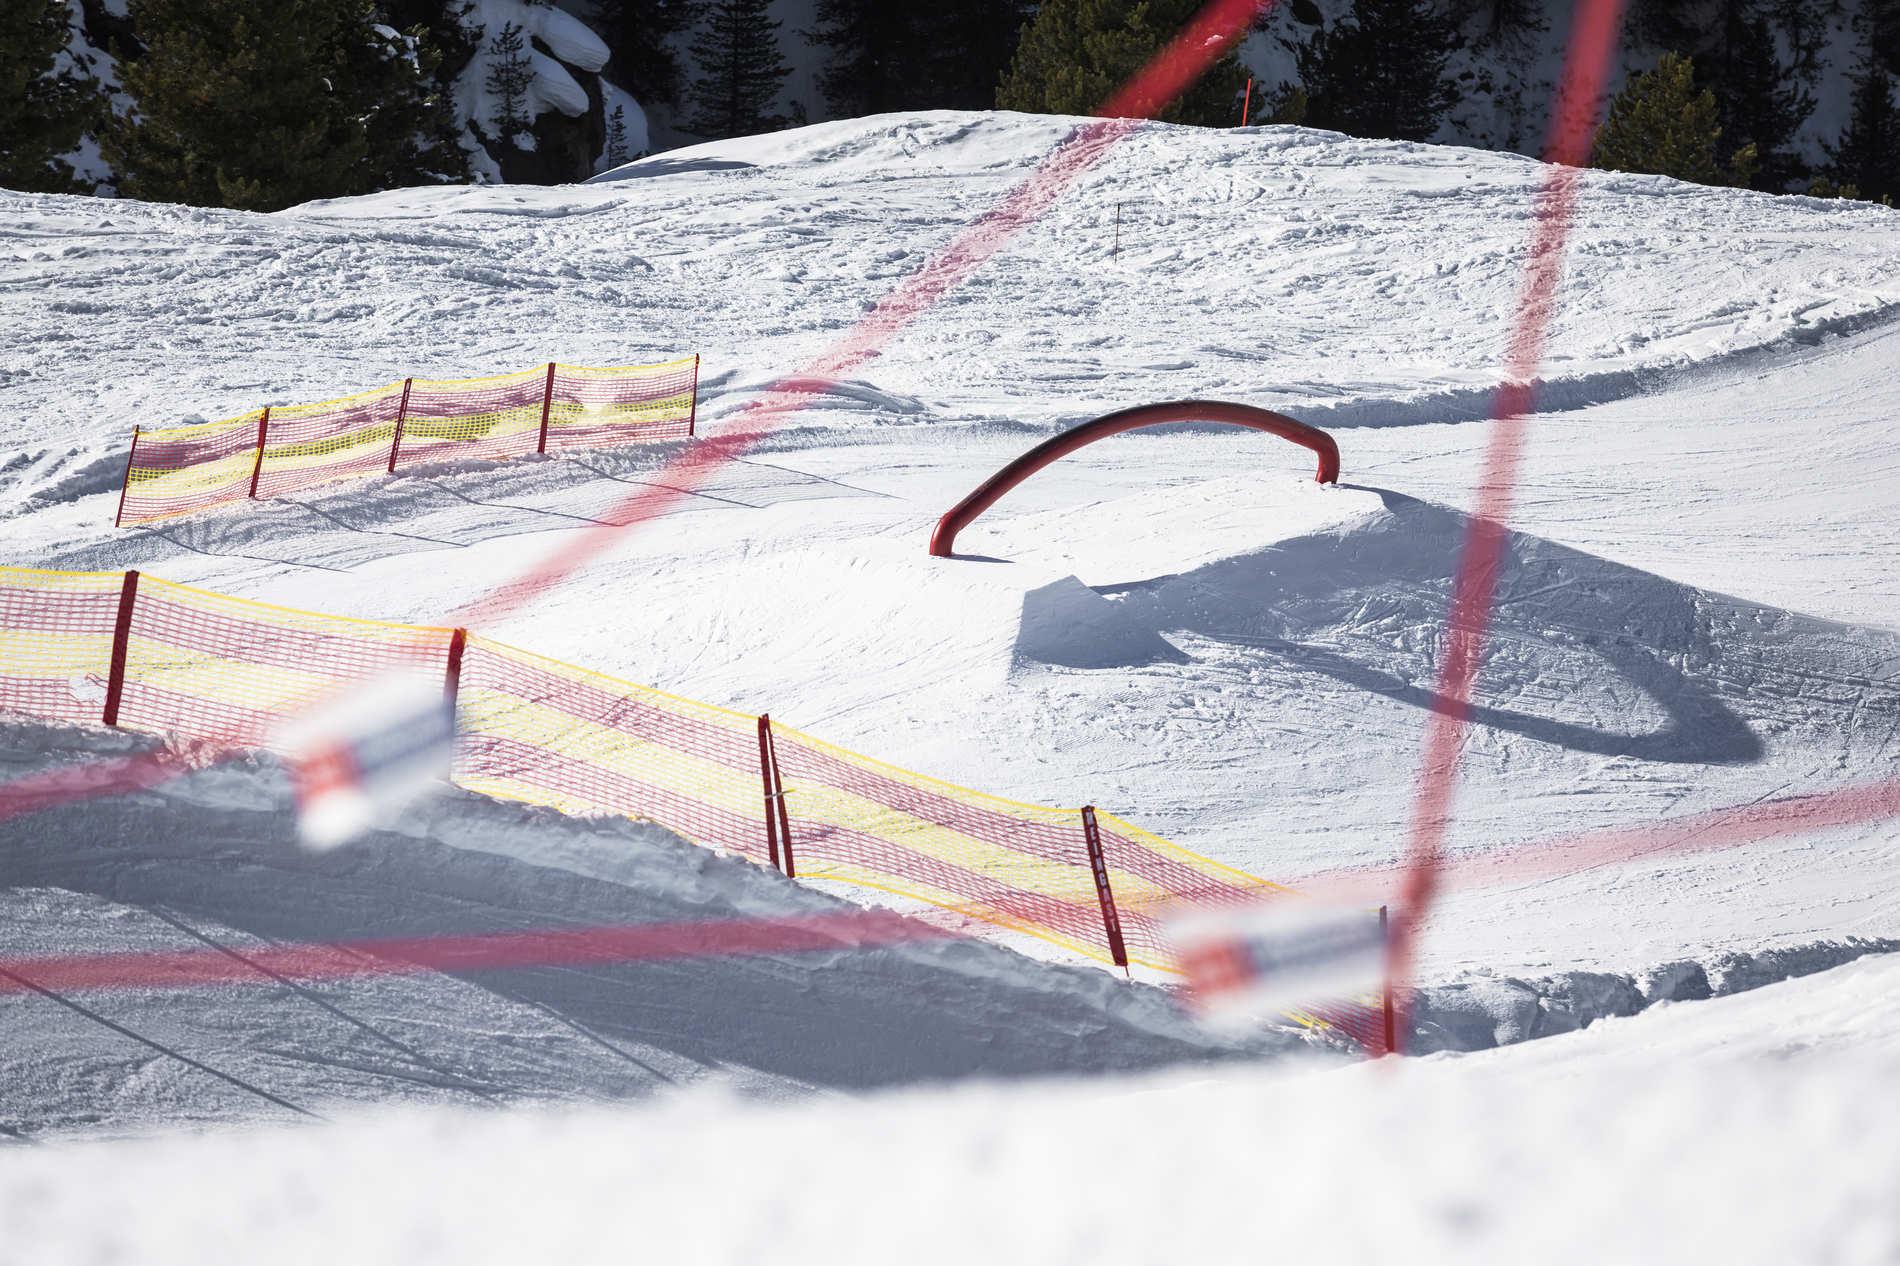 obergurgl 24 02 2018 scenic roland haschka qparks 042